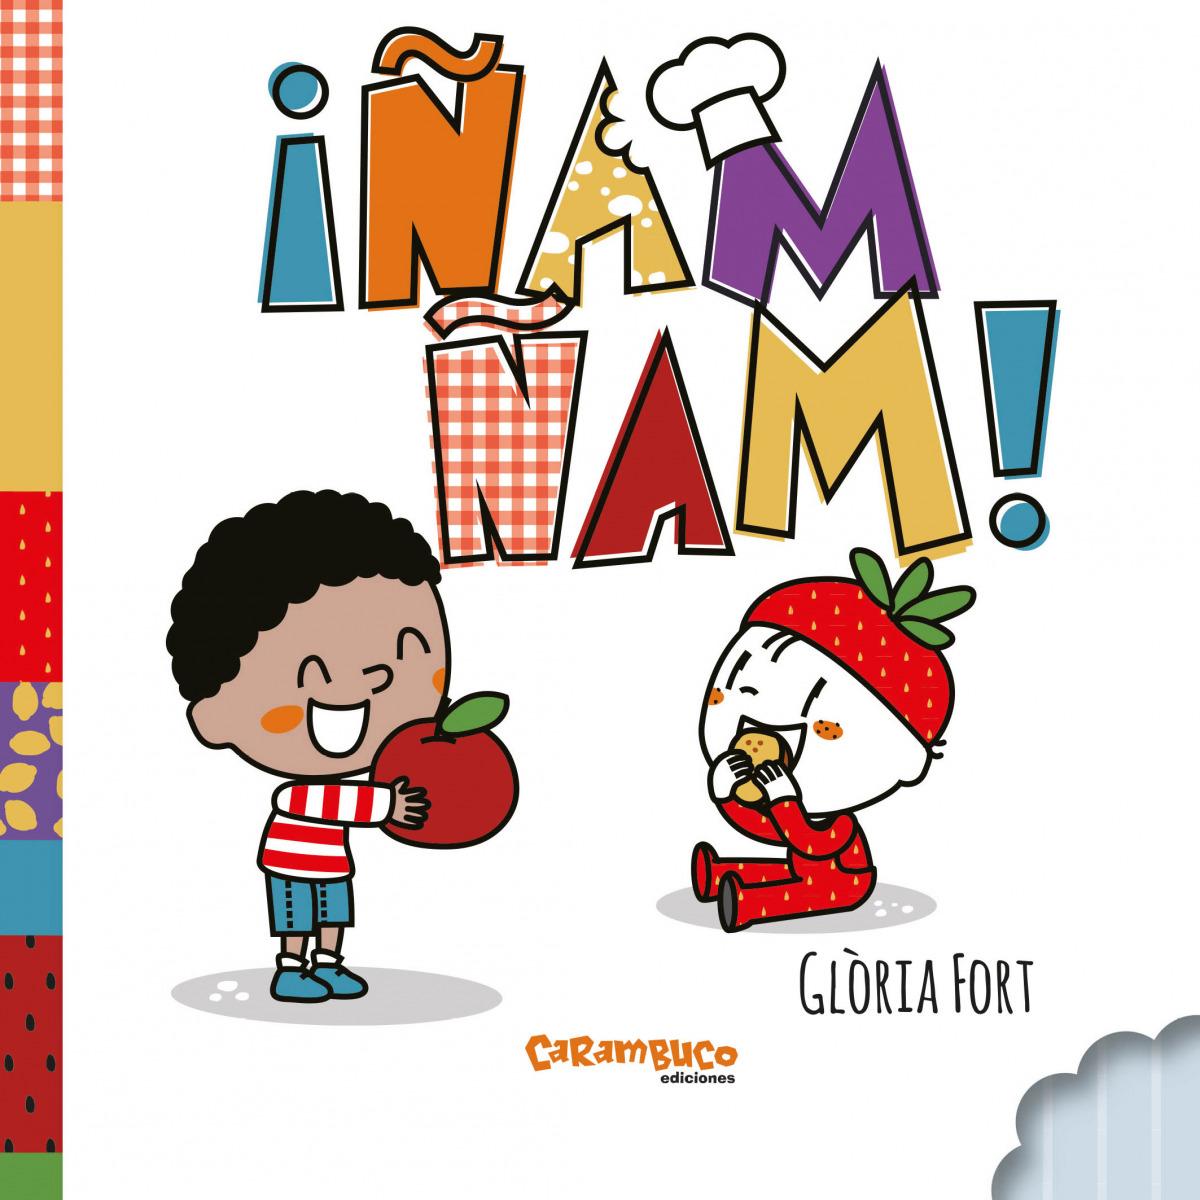 Ñam Ñam